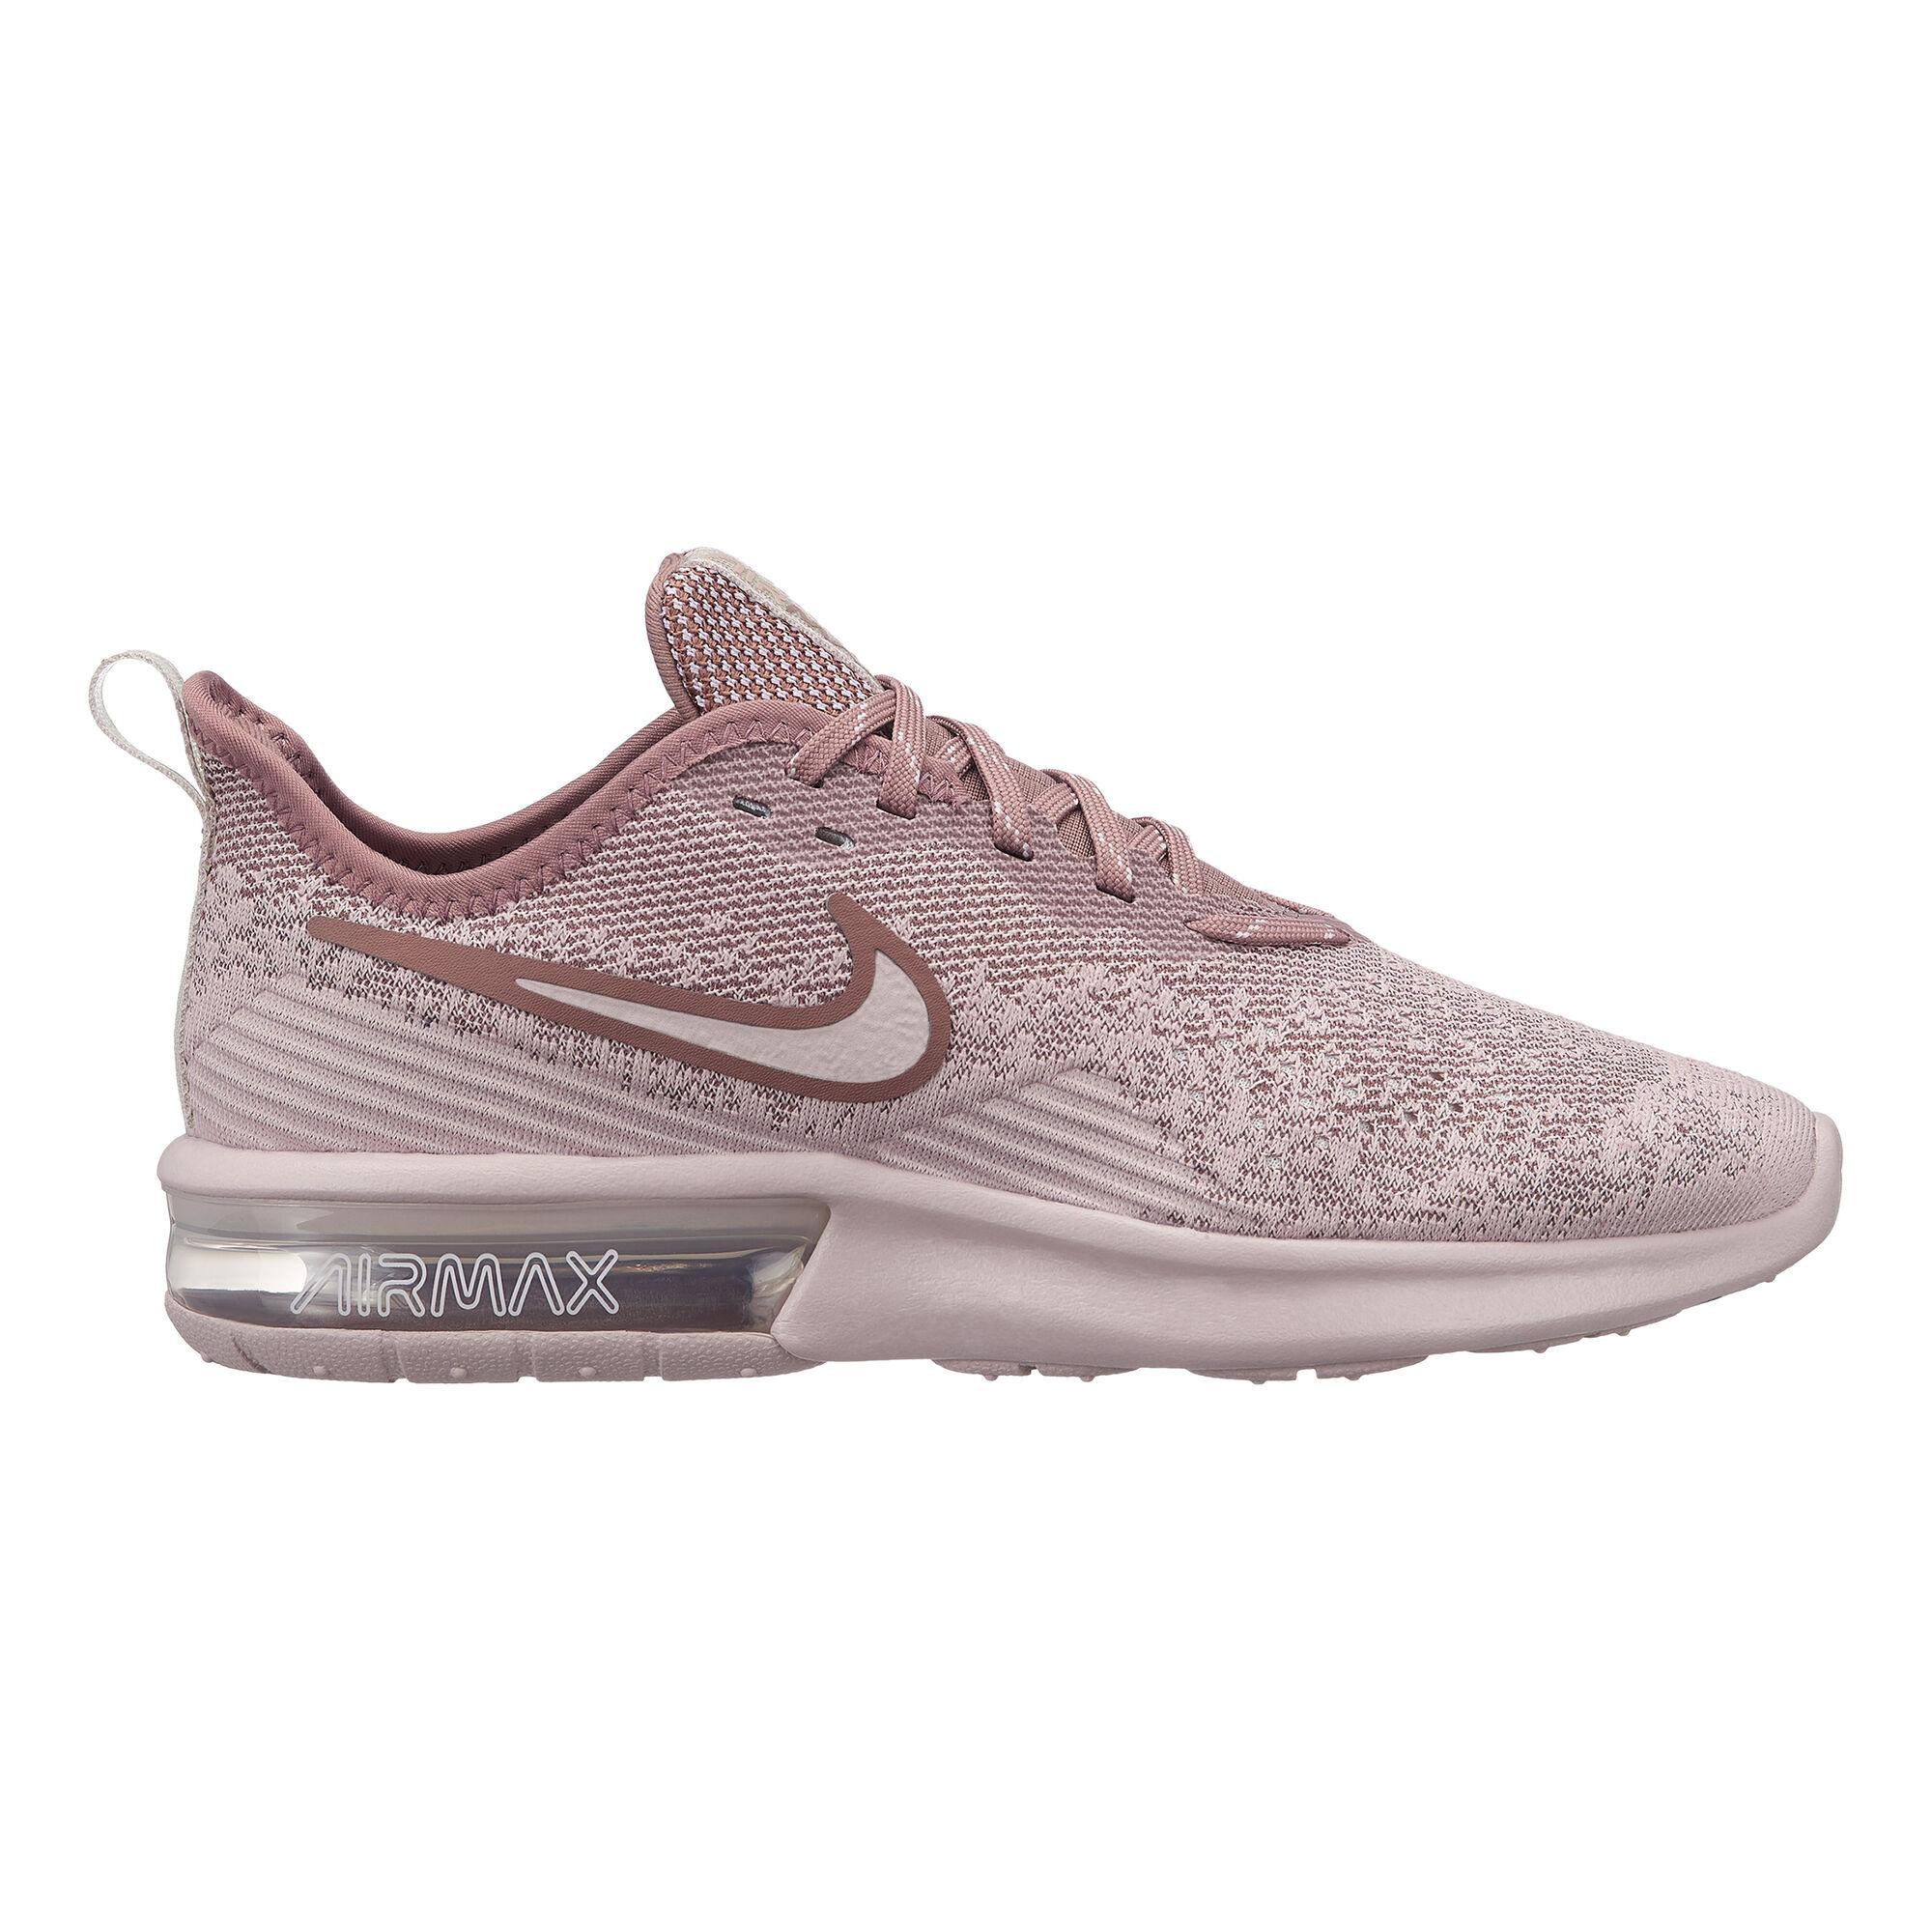 online store 7960f f2997 Nike · Nike · Nike · Nike · Nike · Nike · Nike · Nike · Nike · Nike. Air Max  ...